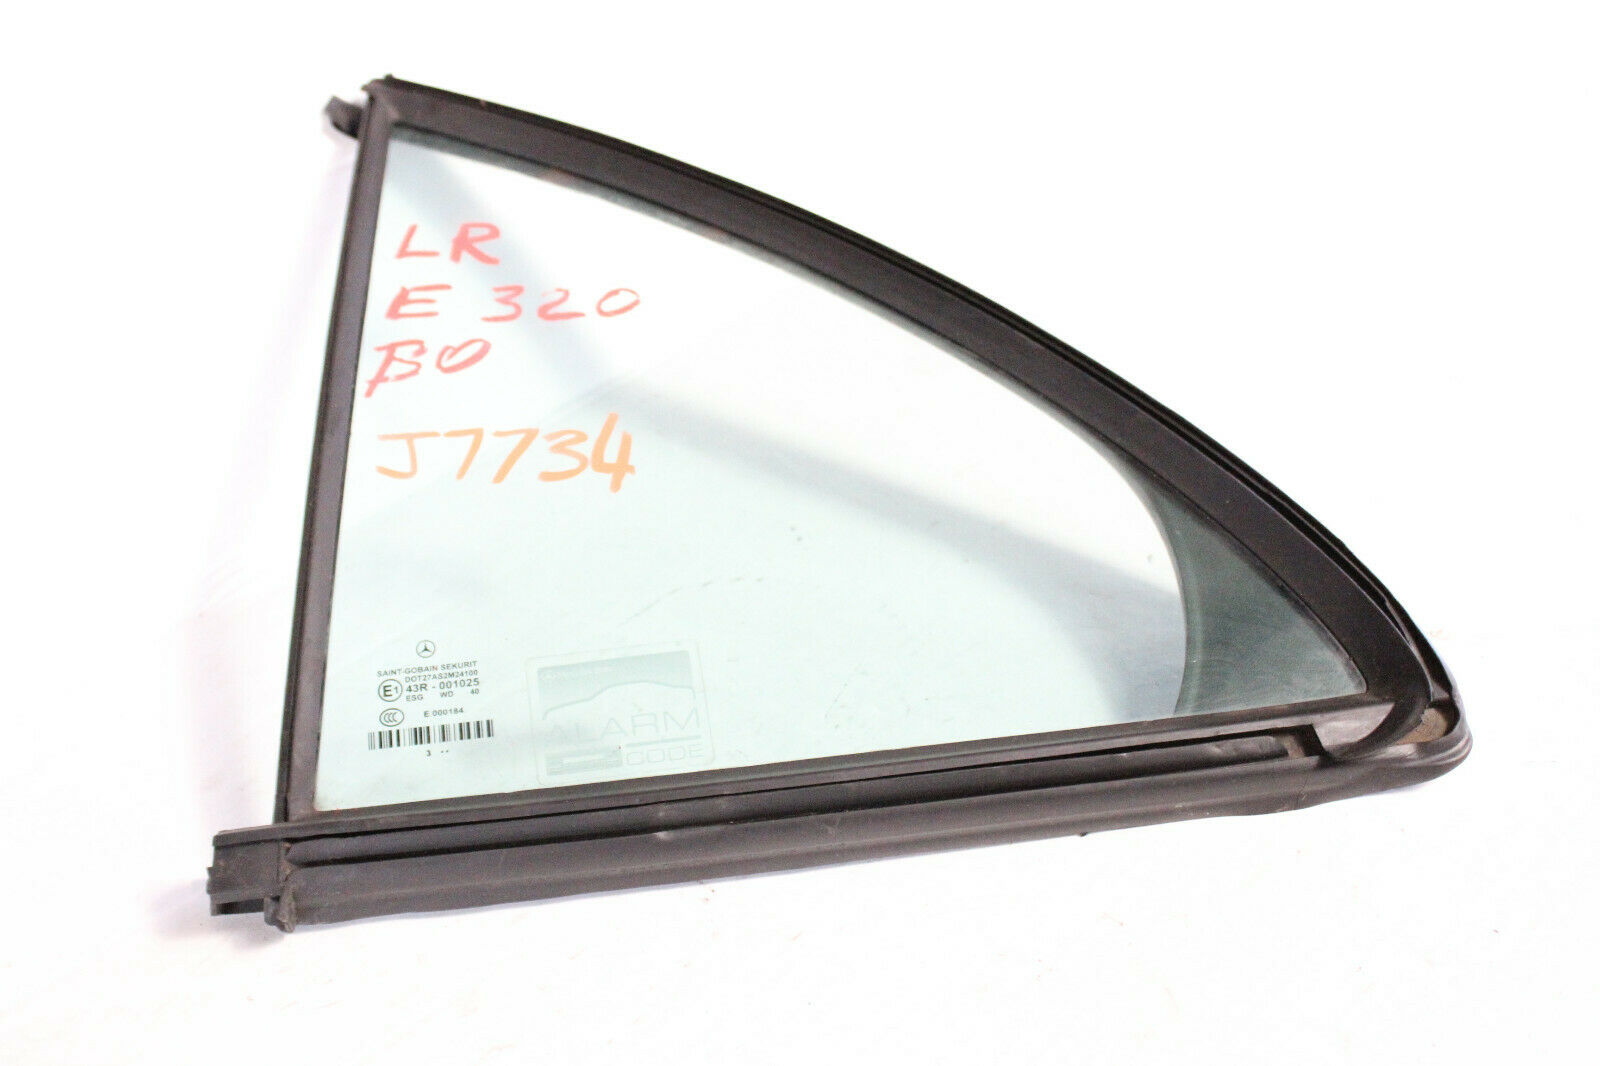 2003-06 MERCEDES W211 E320 E500 SEDAN REAR LEFT SIDE QUARTER WINDOW GLASS J7734